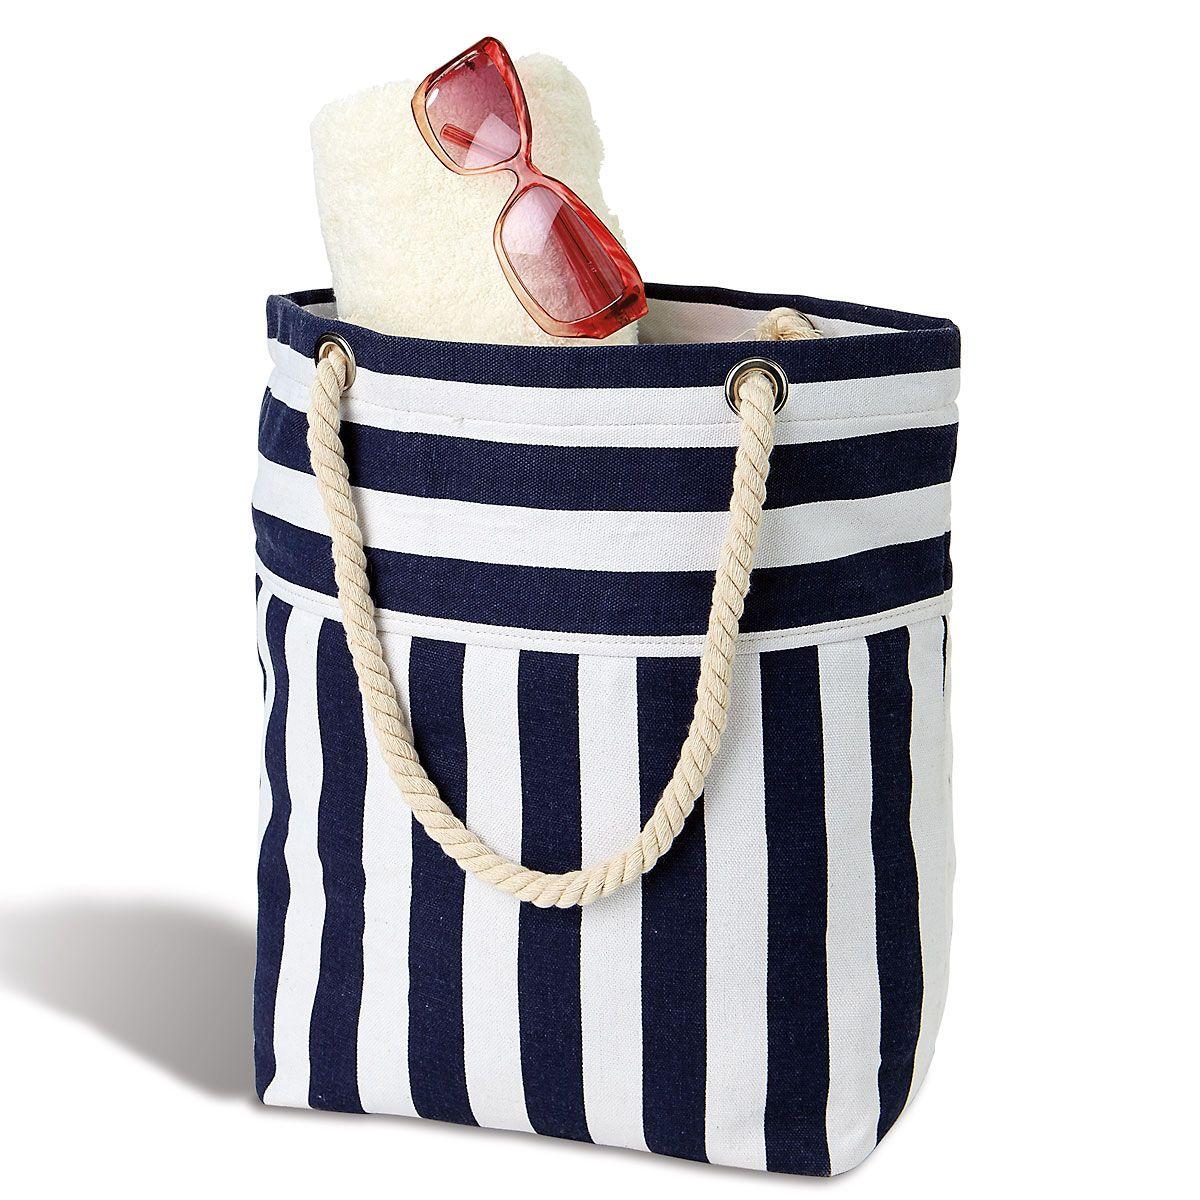 Navy White Striped Tote